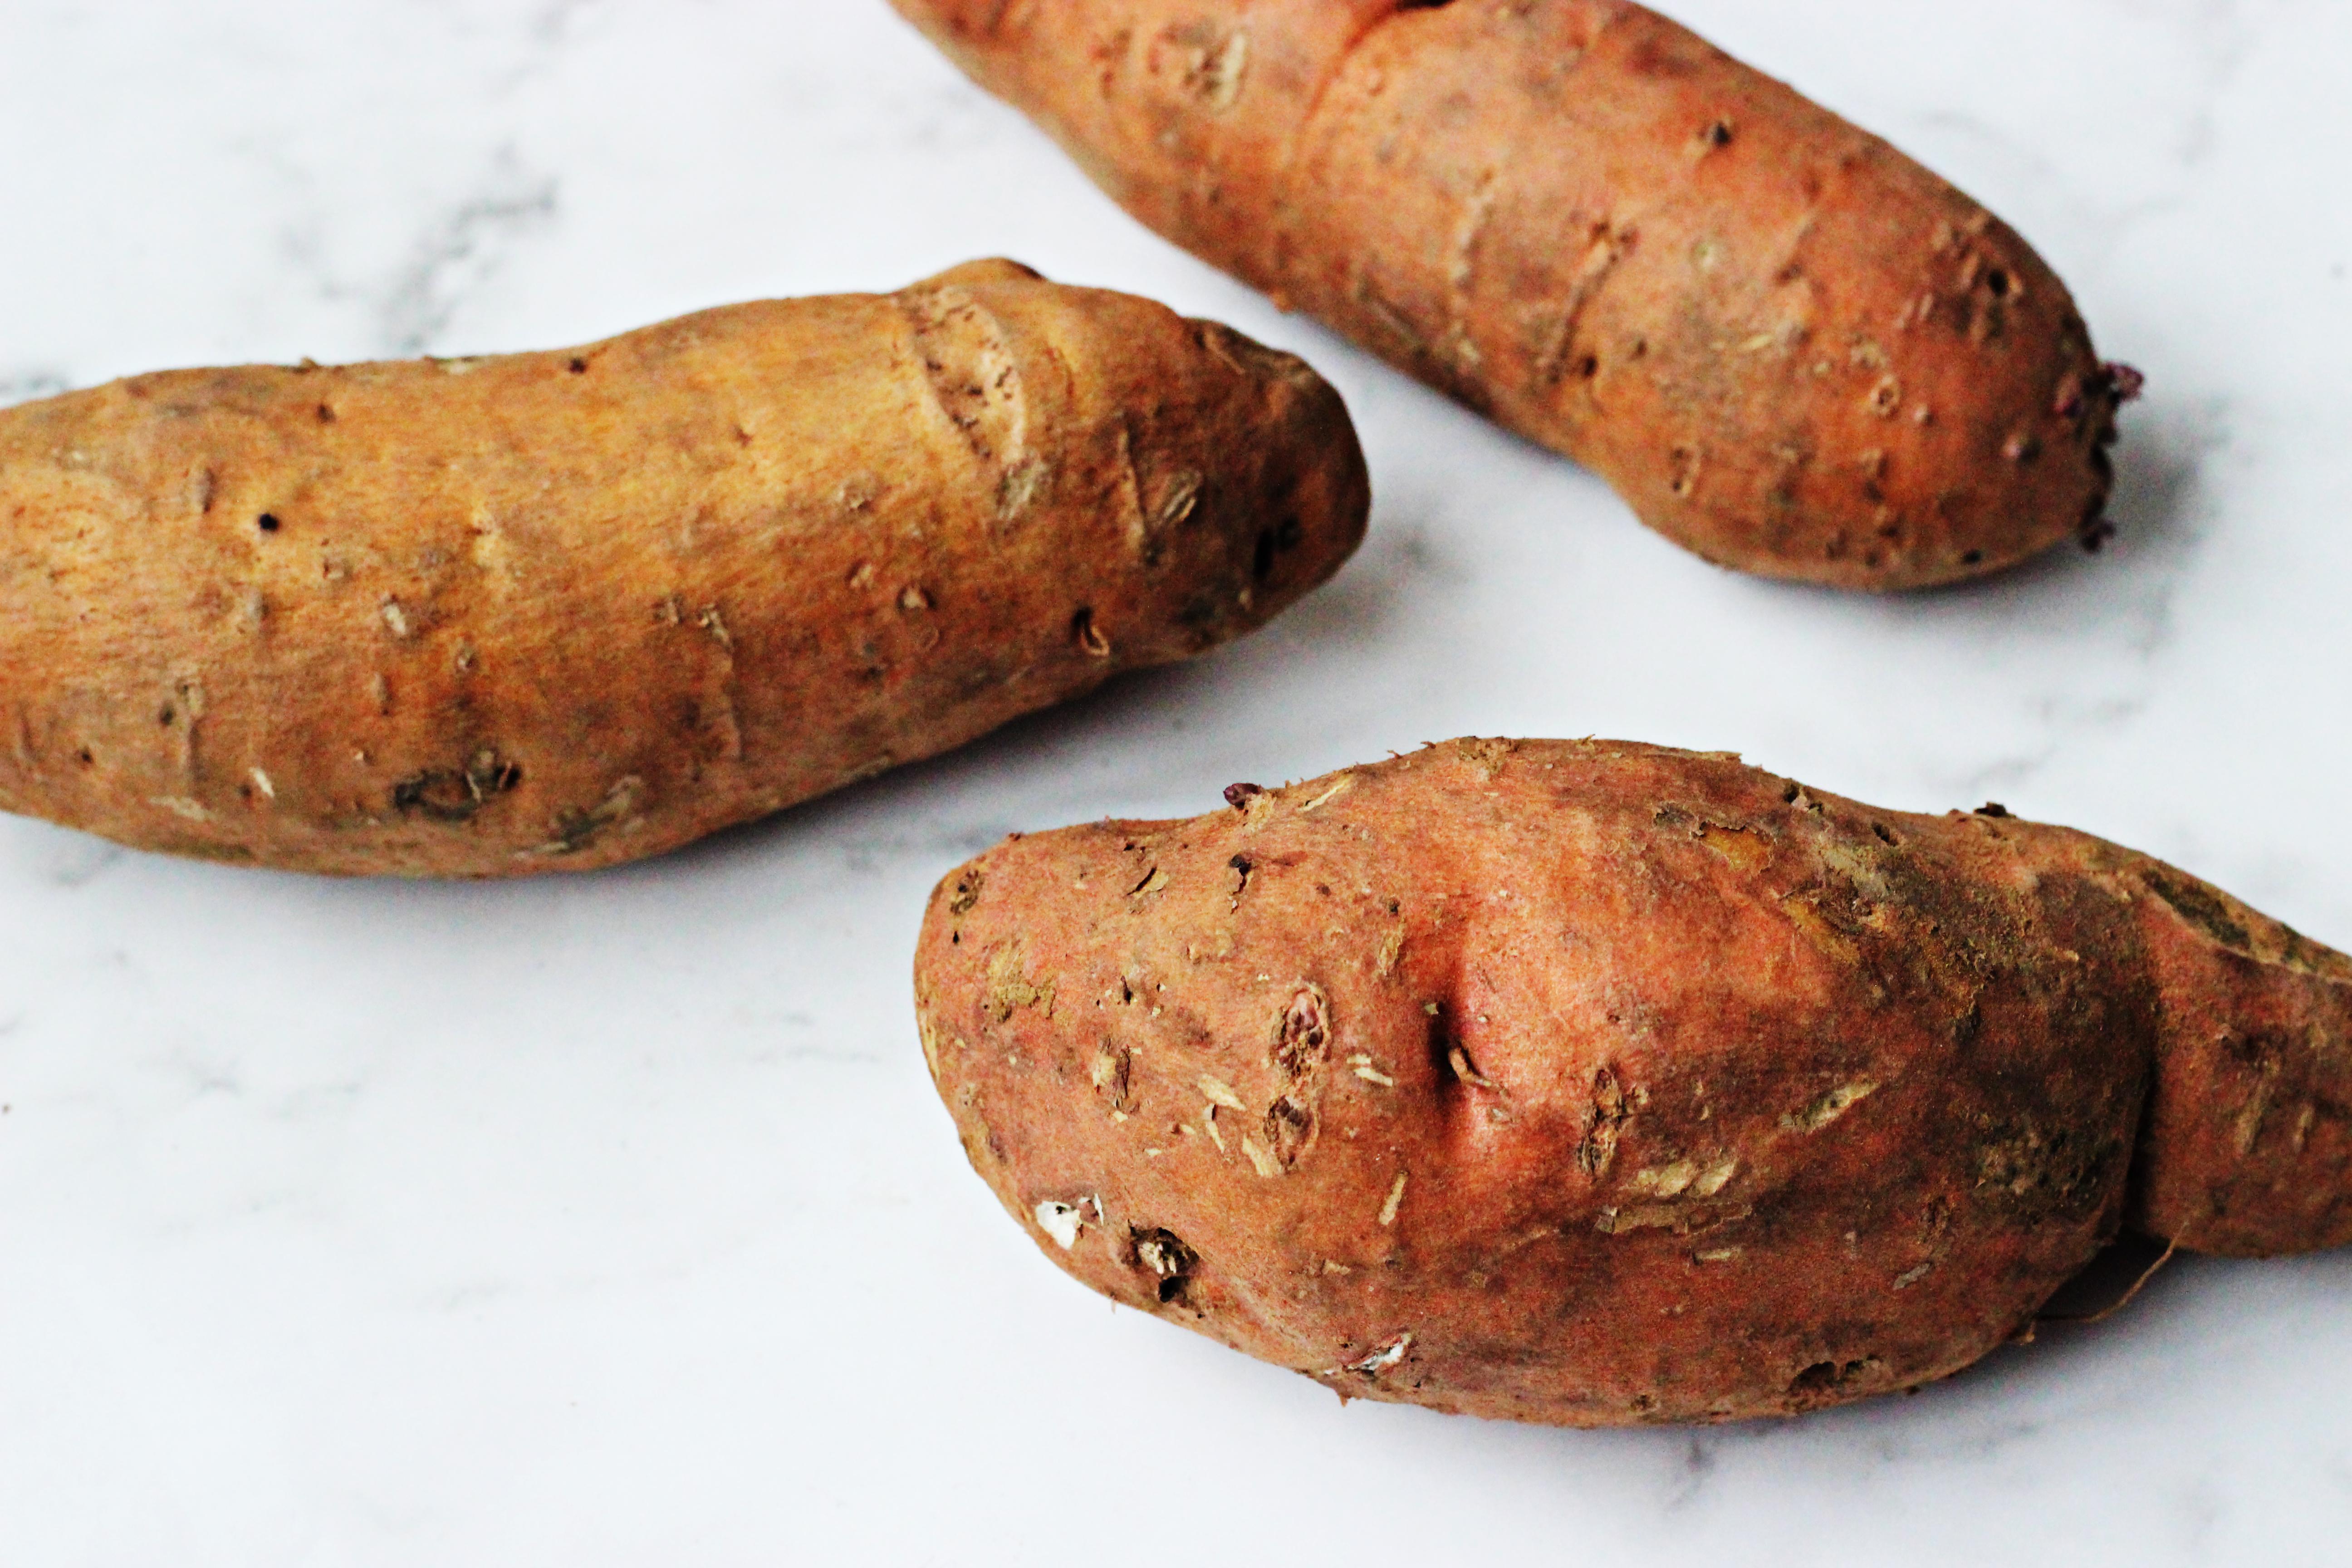 Oven-Baked Sweet Potatoes with Vegan Wrap / Batata Doce Assada no Forno com Wrap Vegano